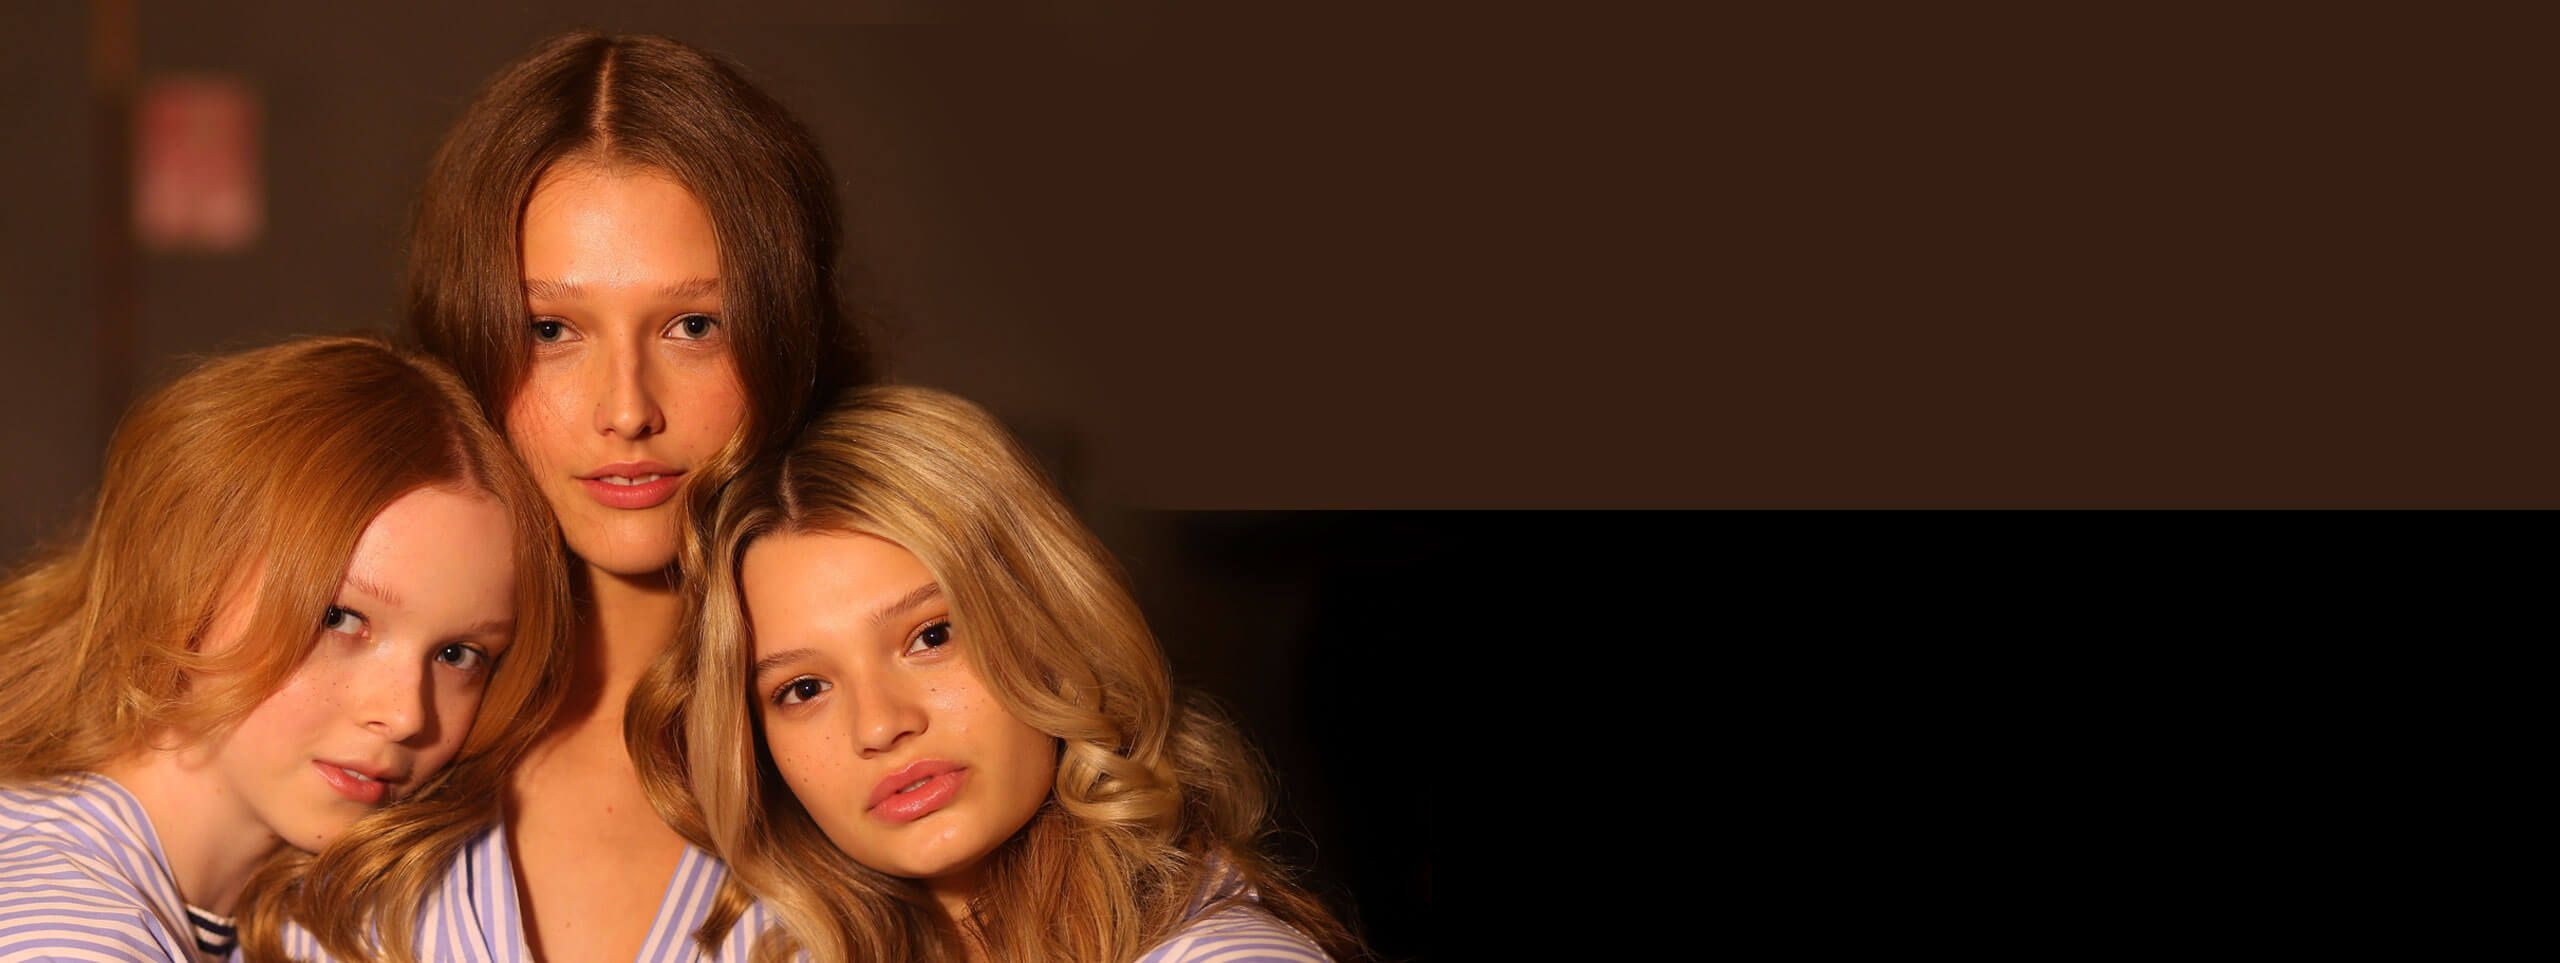 Haarfarbenpsychologie